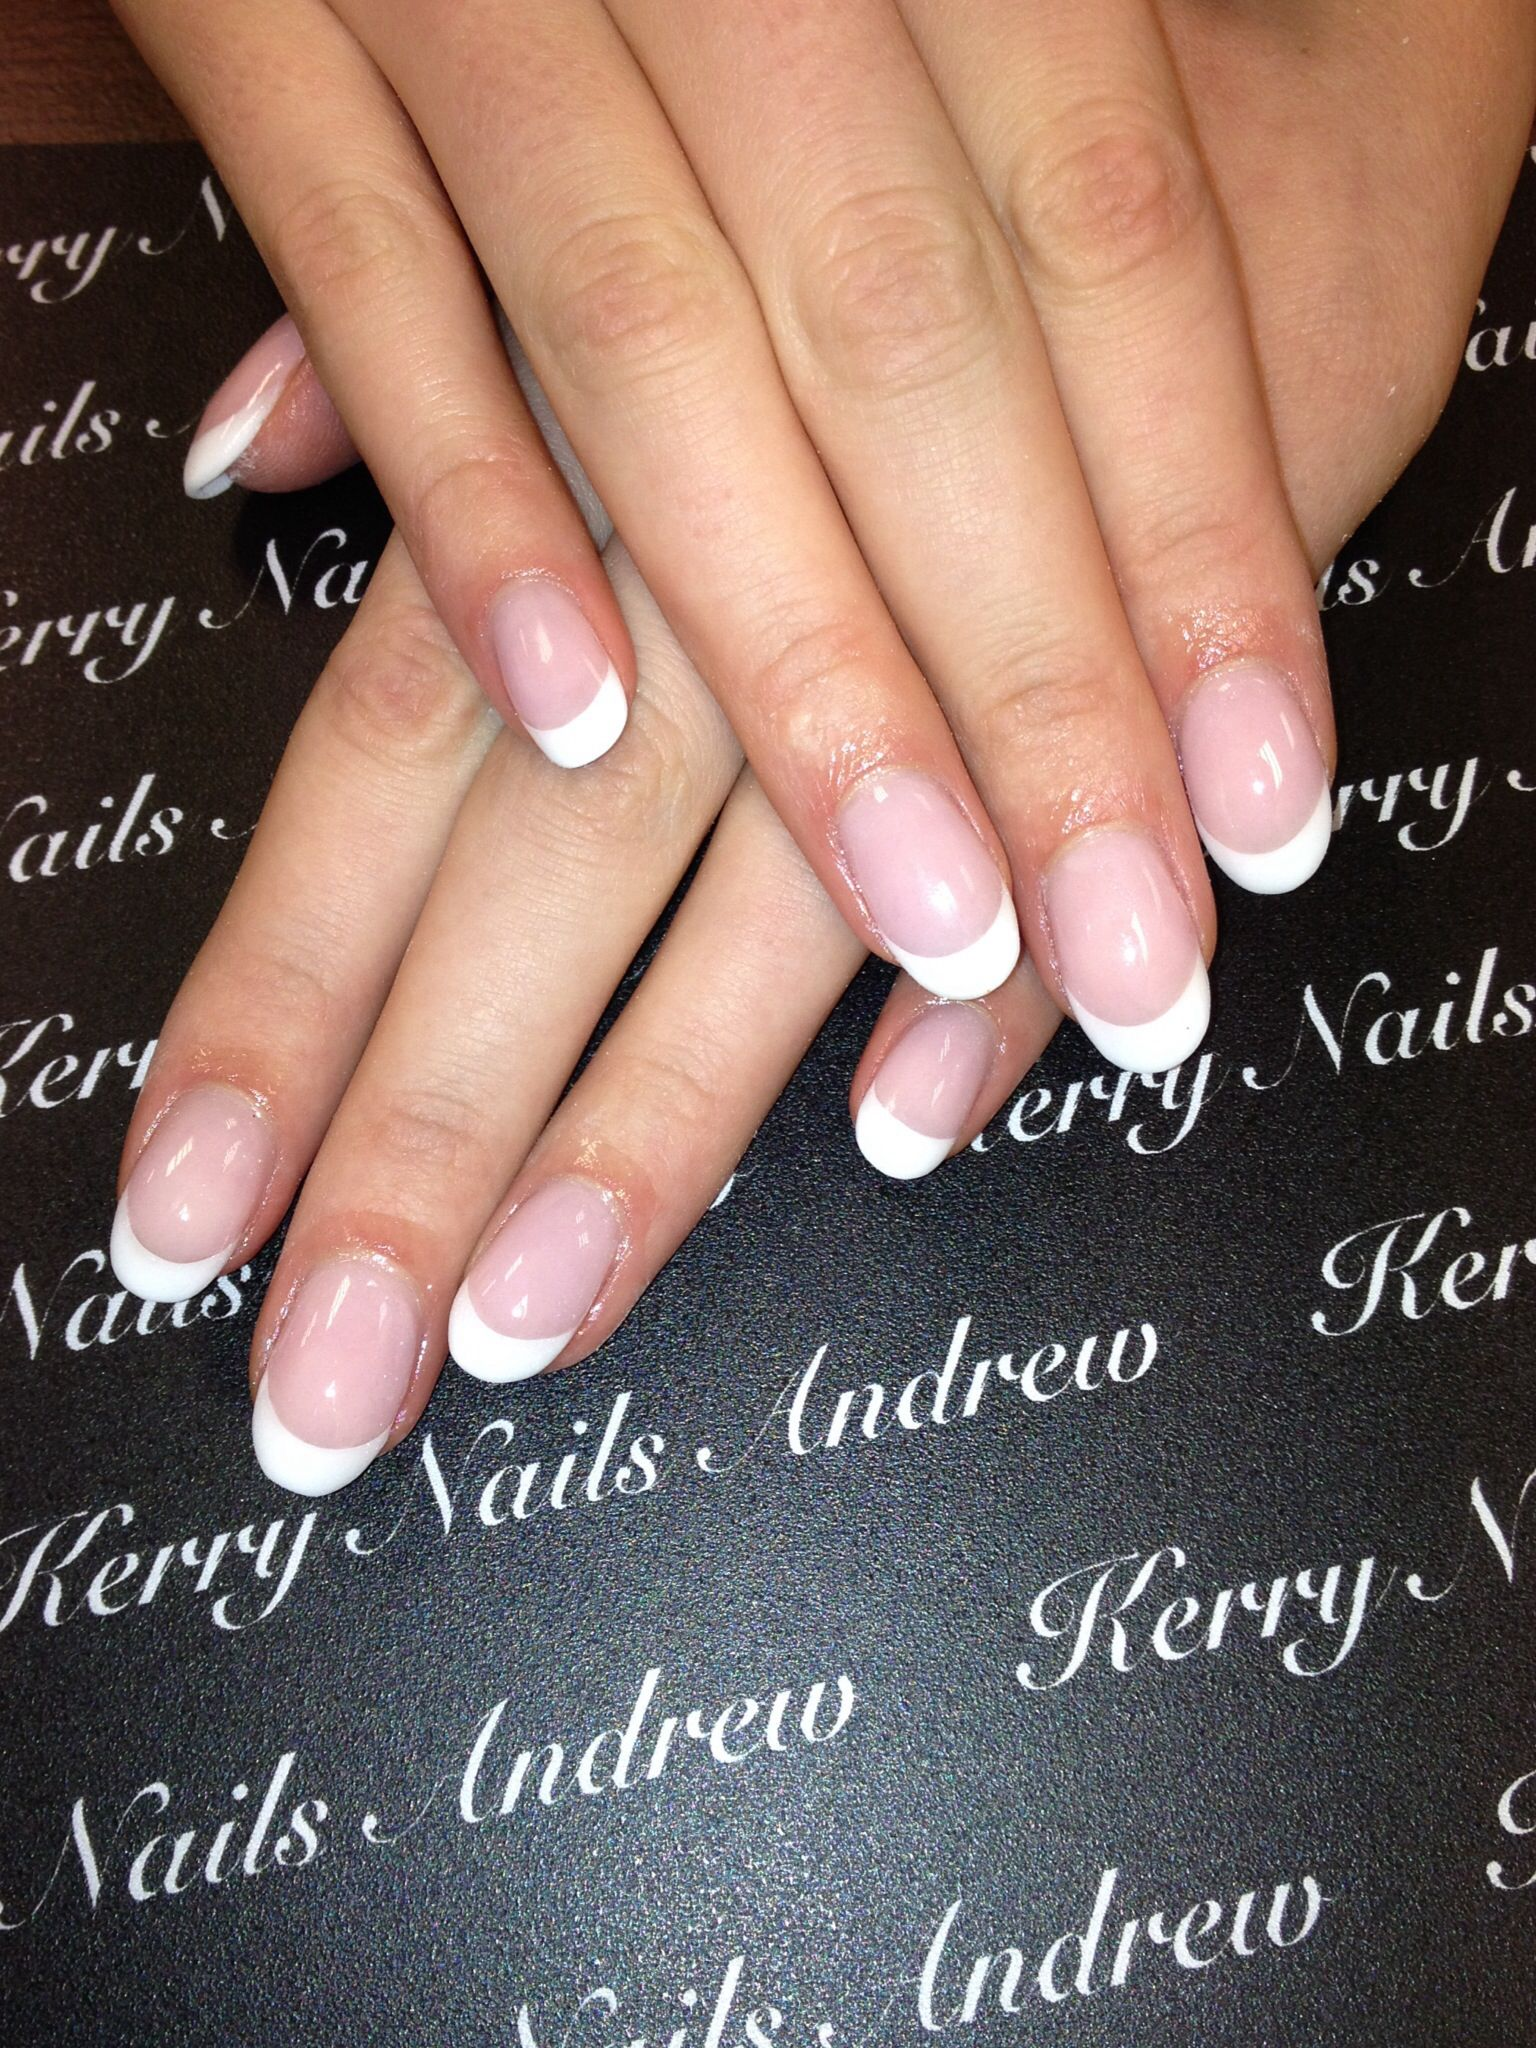 Pink & White Nails | Nail looks | Pinterest | Pink white nails ...